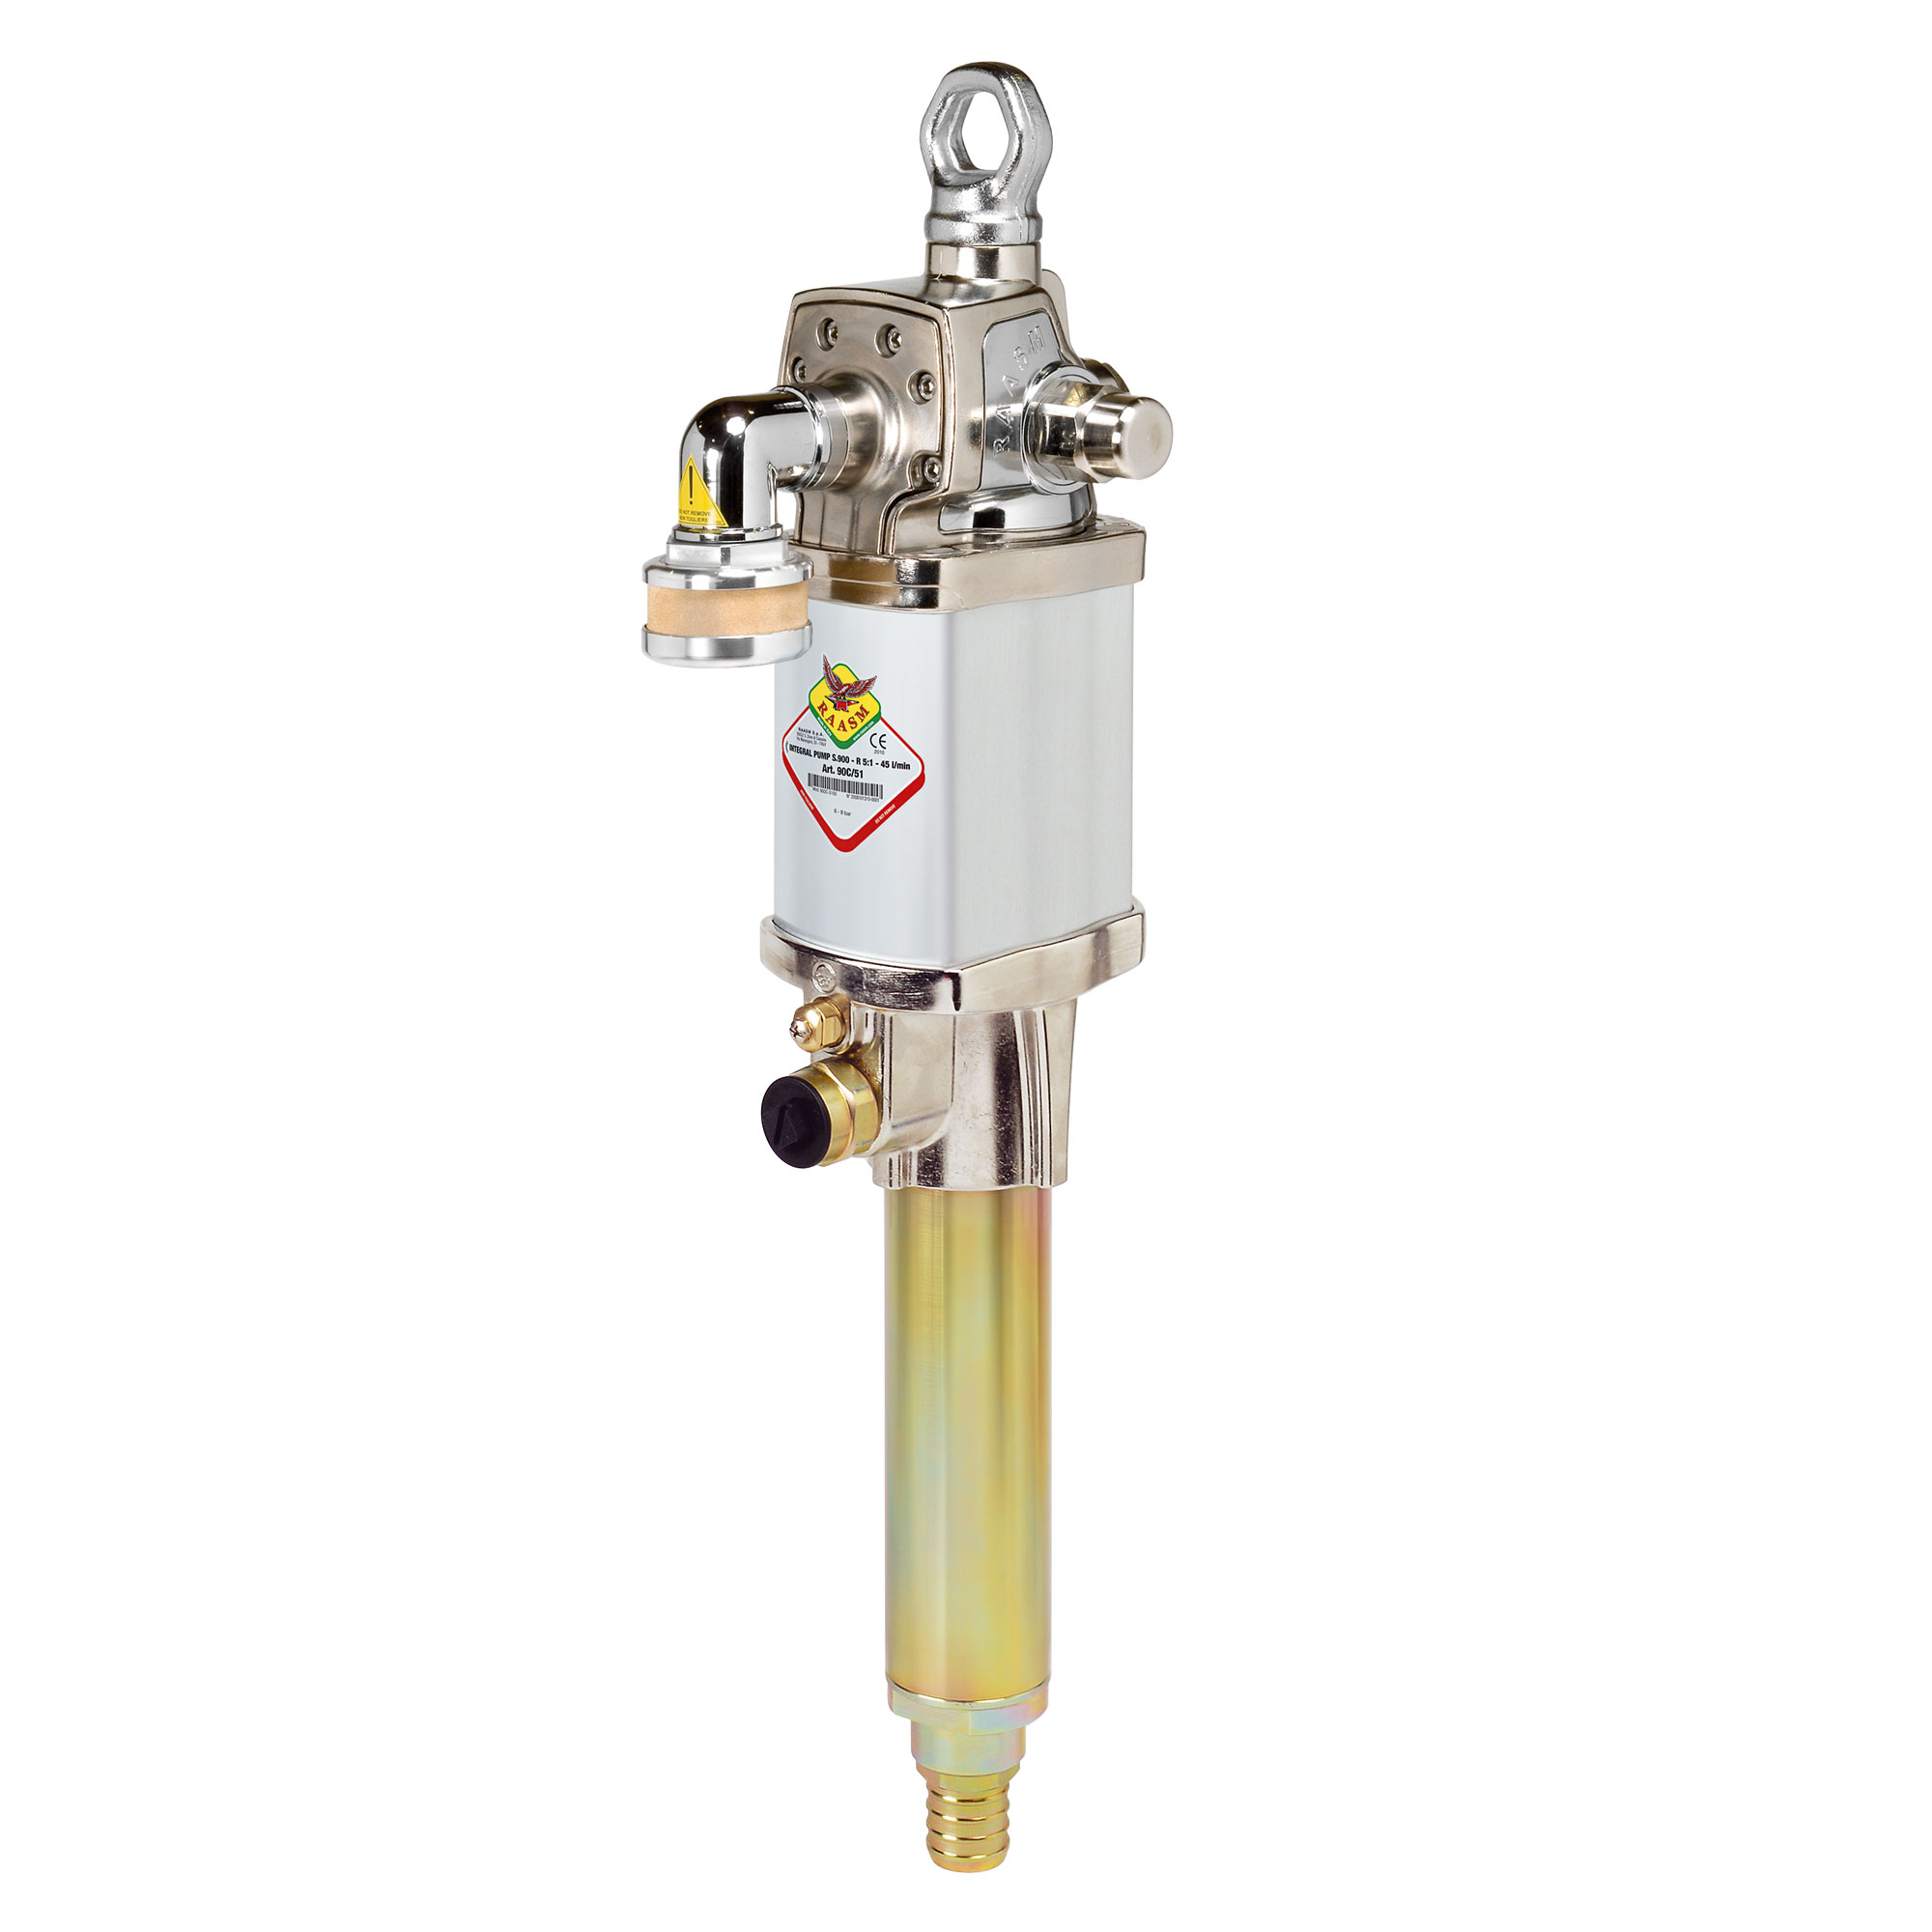 90C.71 - 7:1 Ratio, High Volume Oil Pump Stub